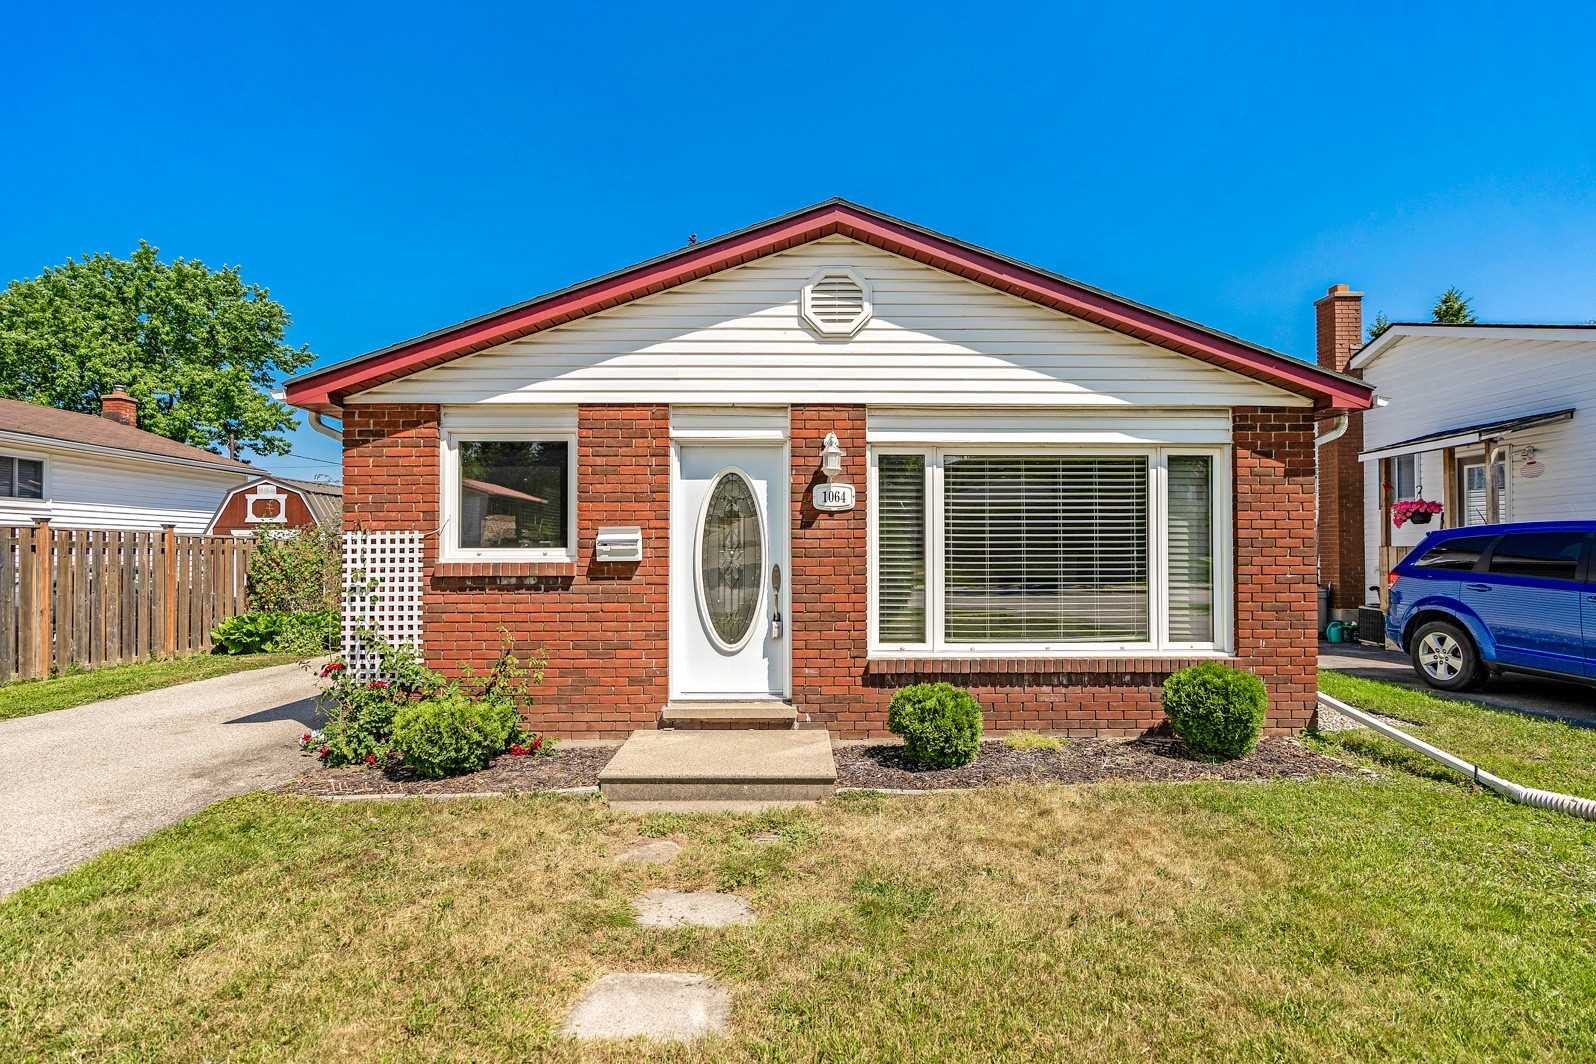 1064 10th St, Owen Sound, Ontario N4K 1T6, 3 Bedrooms Bedrooms, ,2 BathroomsBathrooms,Detached,For Sale,10th,X5273089